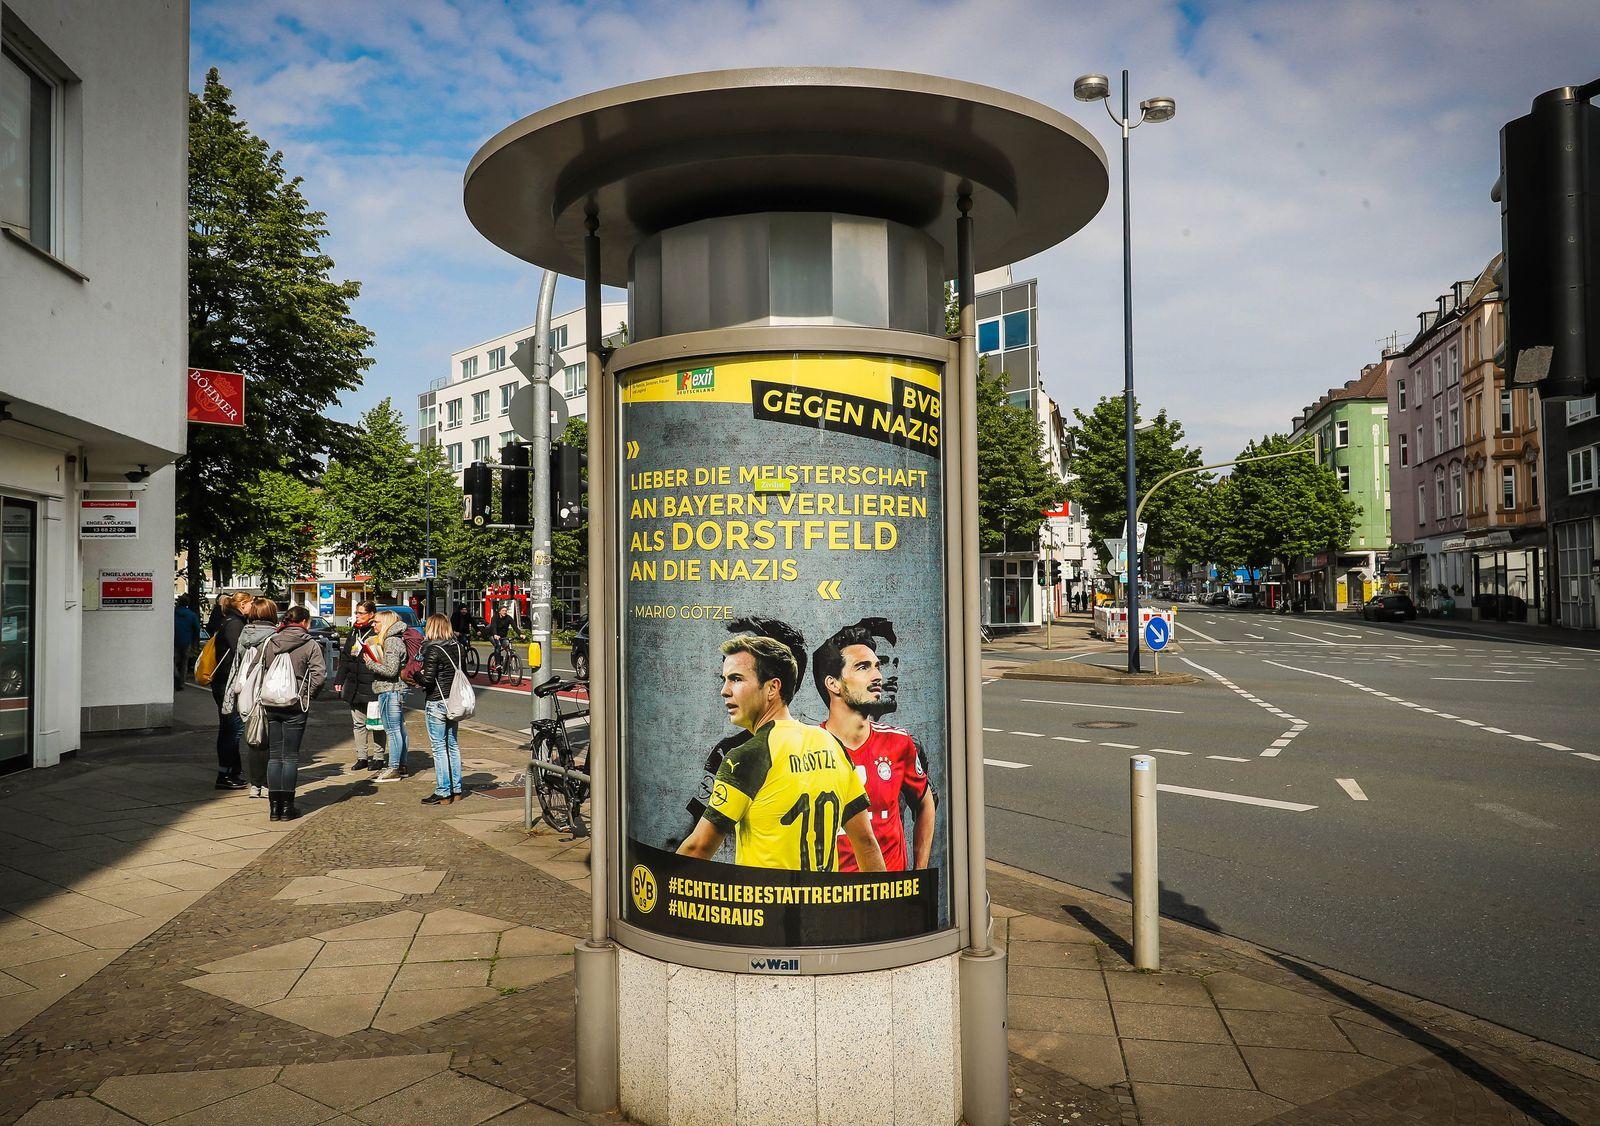 Borussia Dortmund/ Plakate/ BVB gegen Nazis